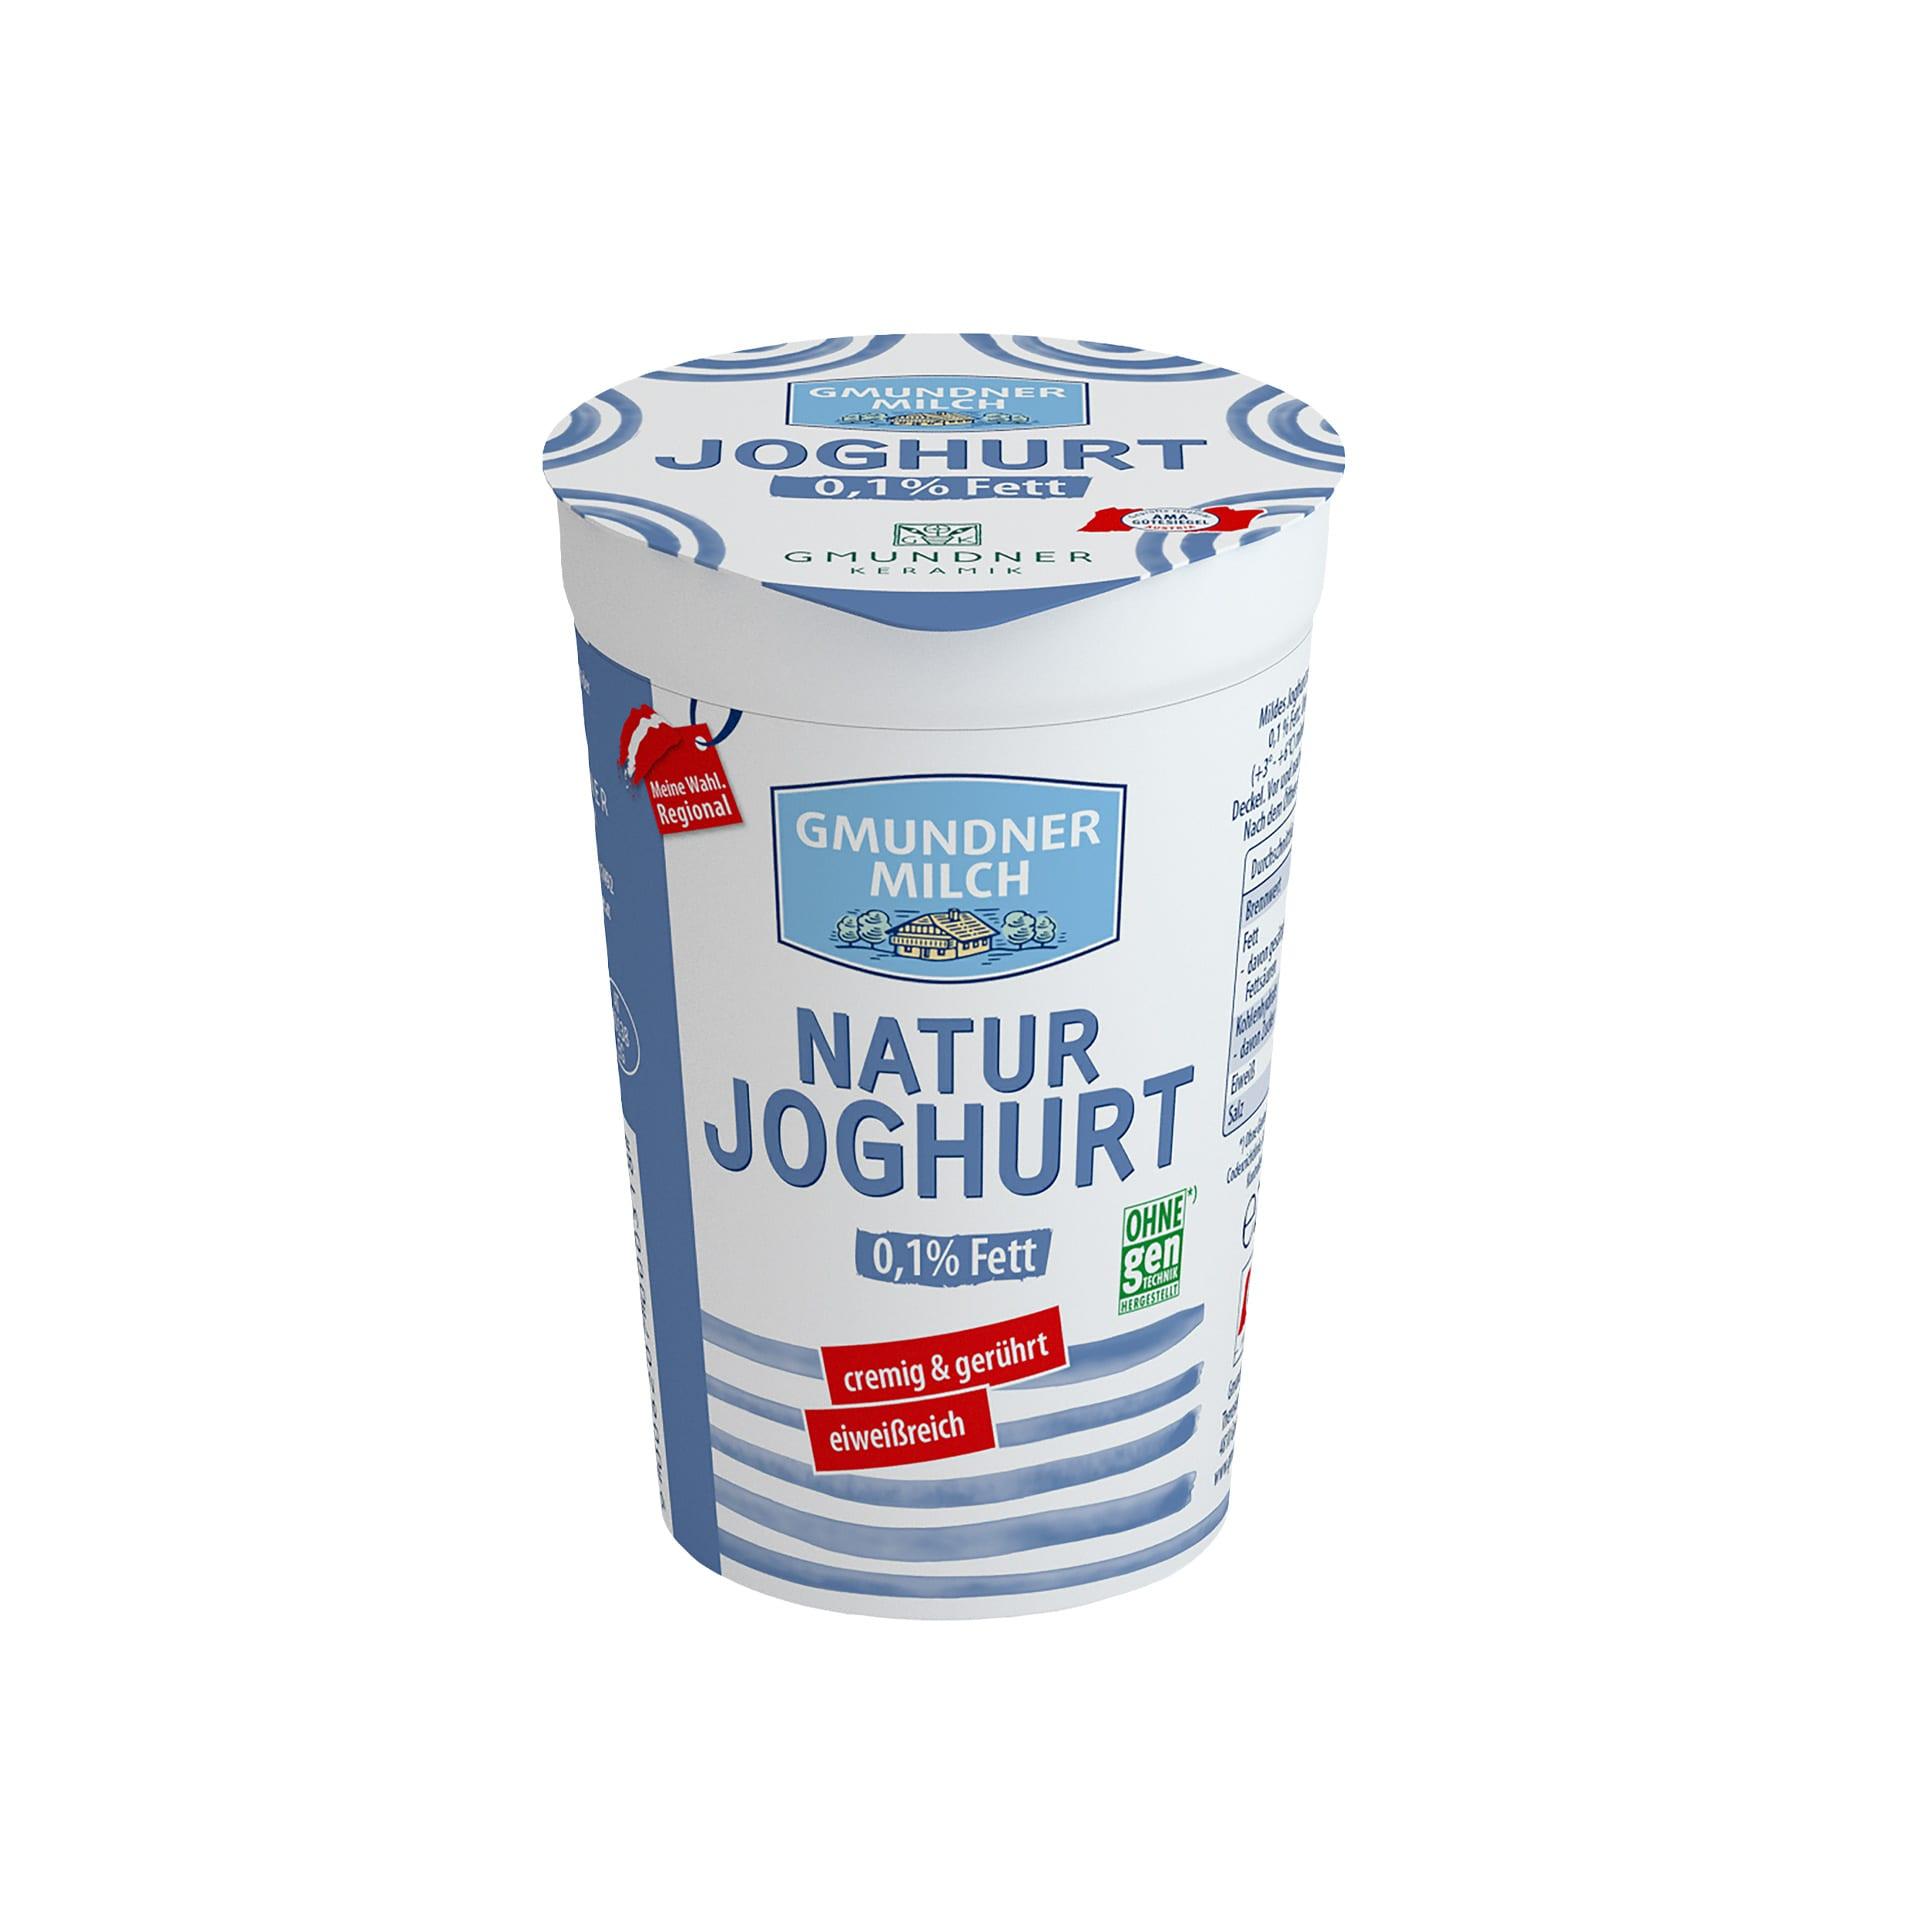 Joghurt 0,1%